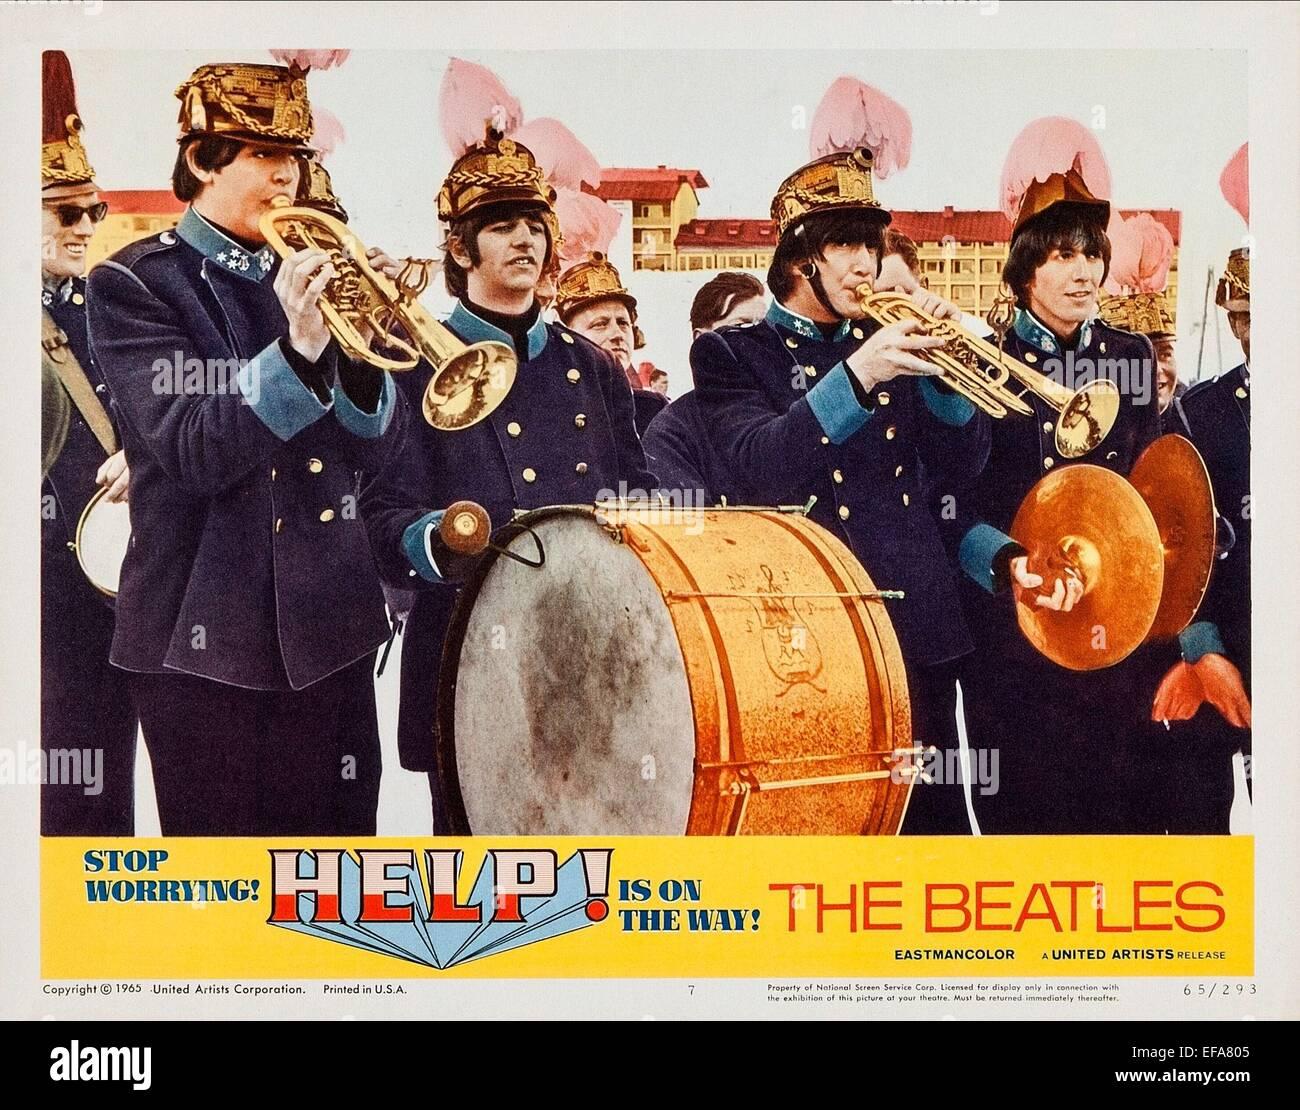 PAUL MCCARTNEY, JOHN LENNON, RINGO STARR, GEORGE HARRISON, HELP!, 1965 - Stock Image